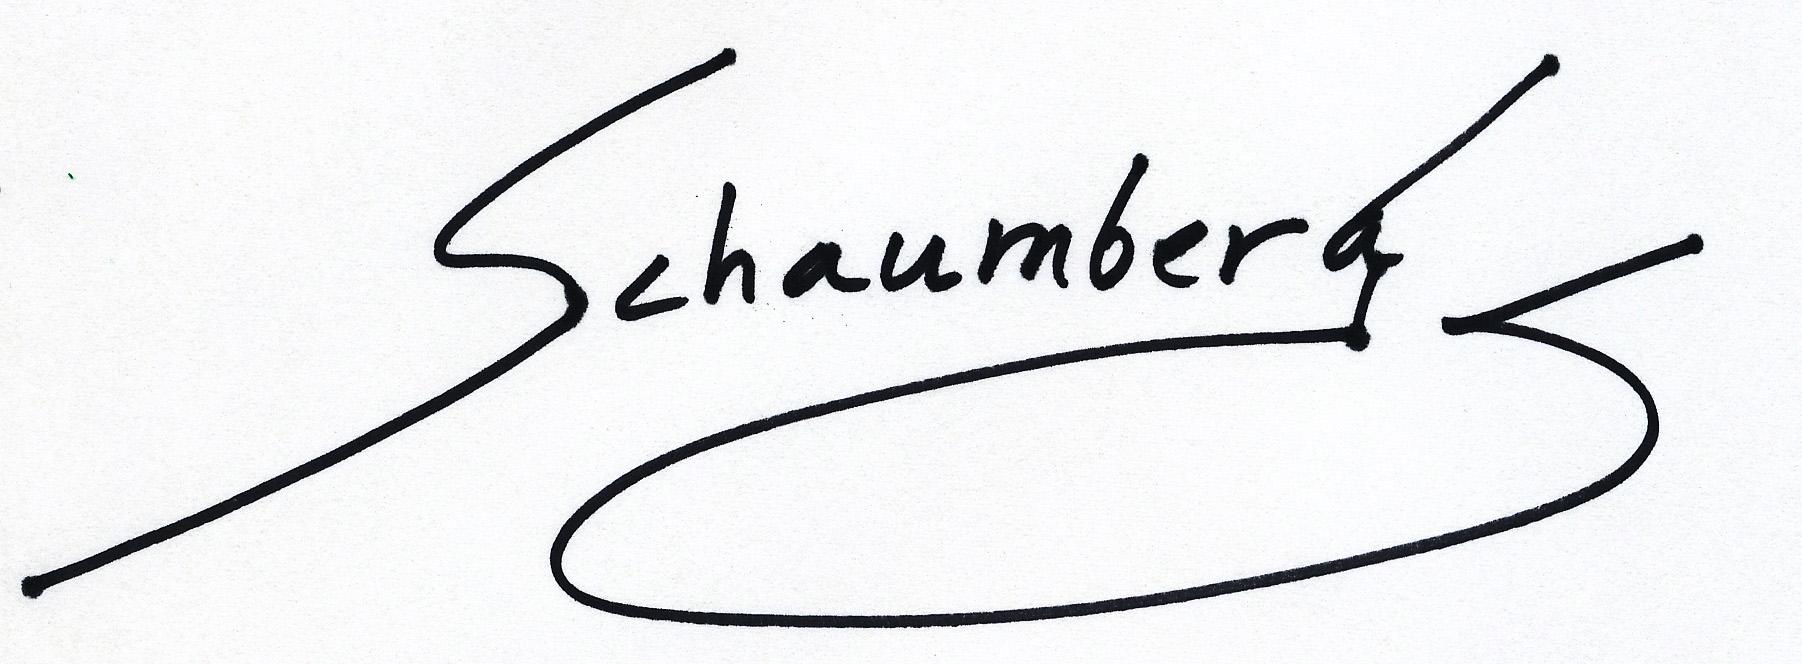 debraschaumberg's Signature